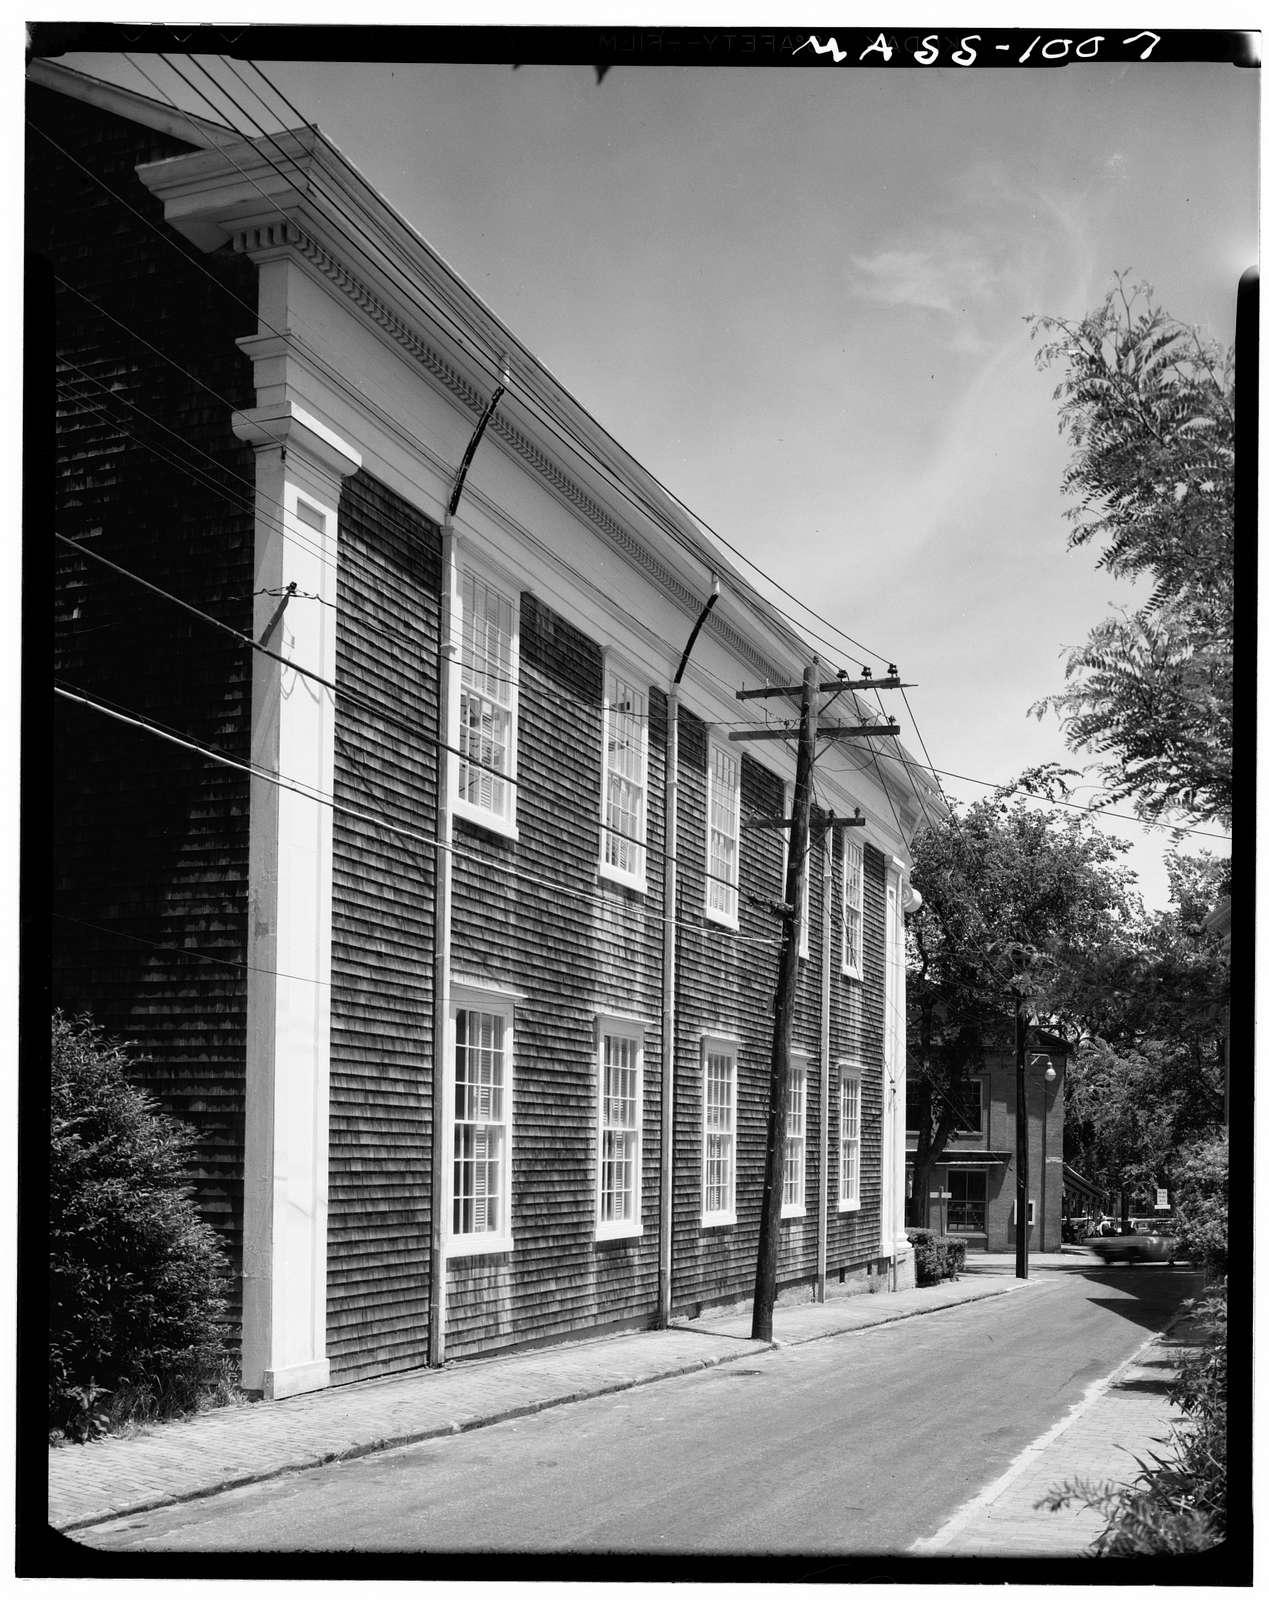 Centre Street United Methodist Church, Centre & Main Streets, Nantucket, Nantucket County, MA